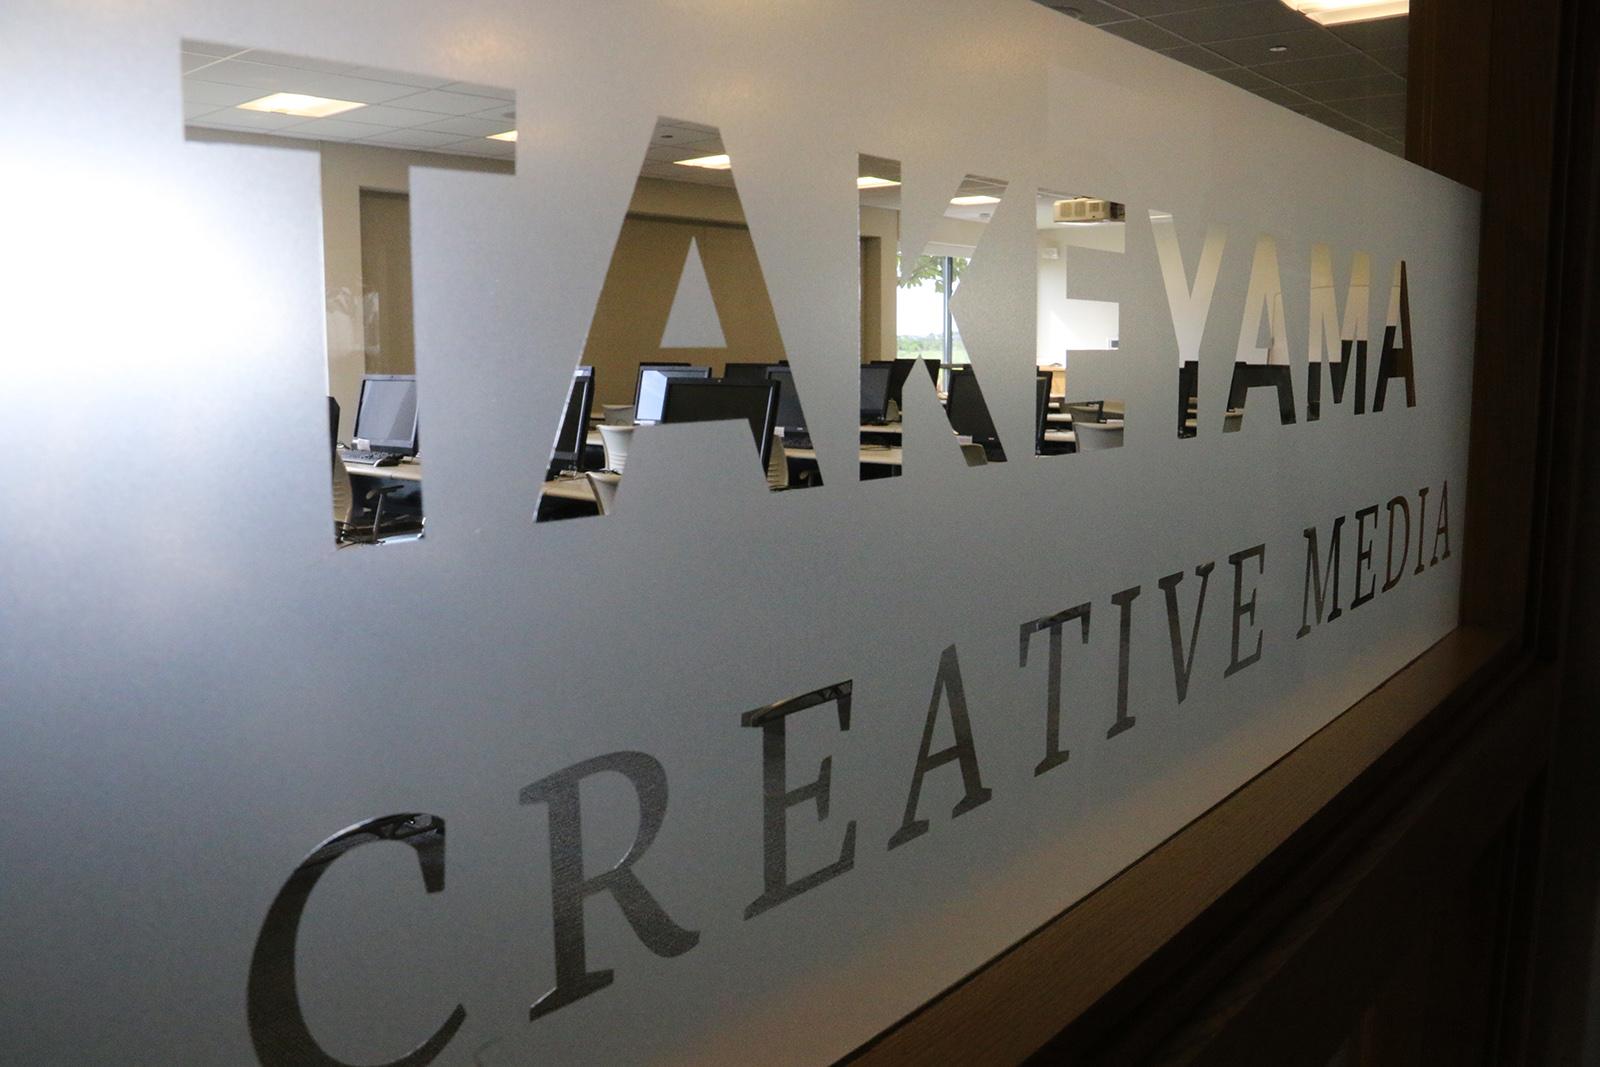 Takeyama Creative Media Lab